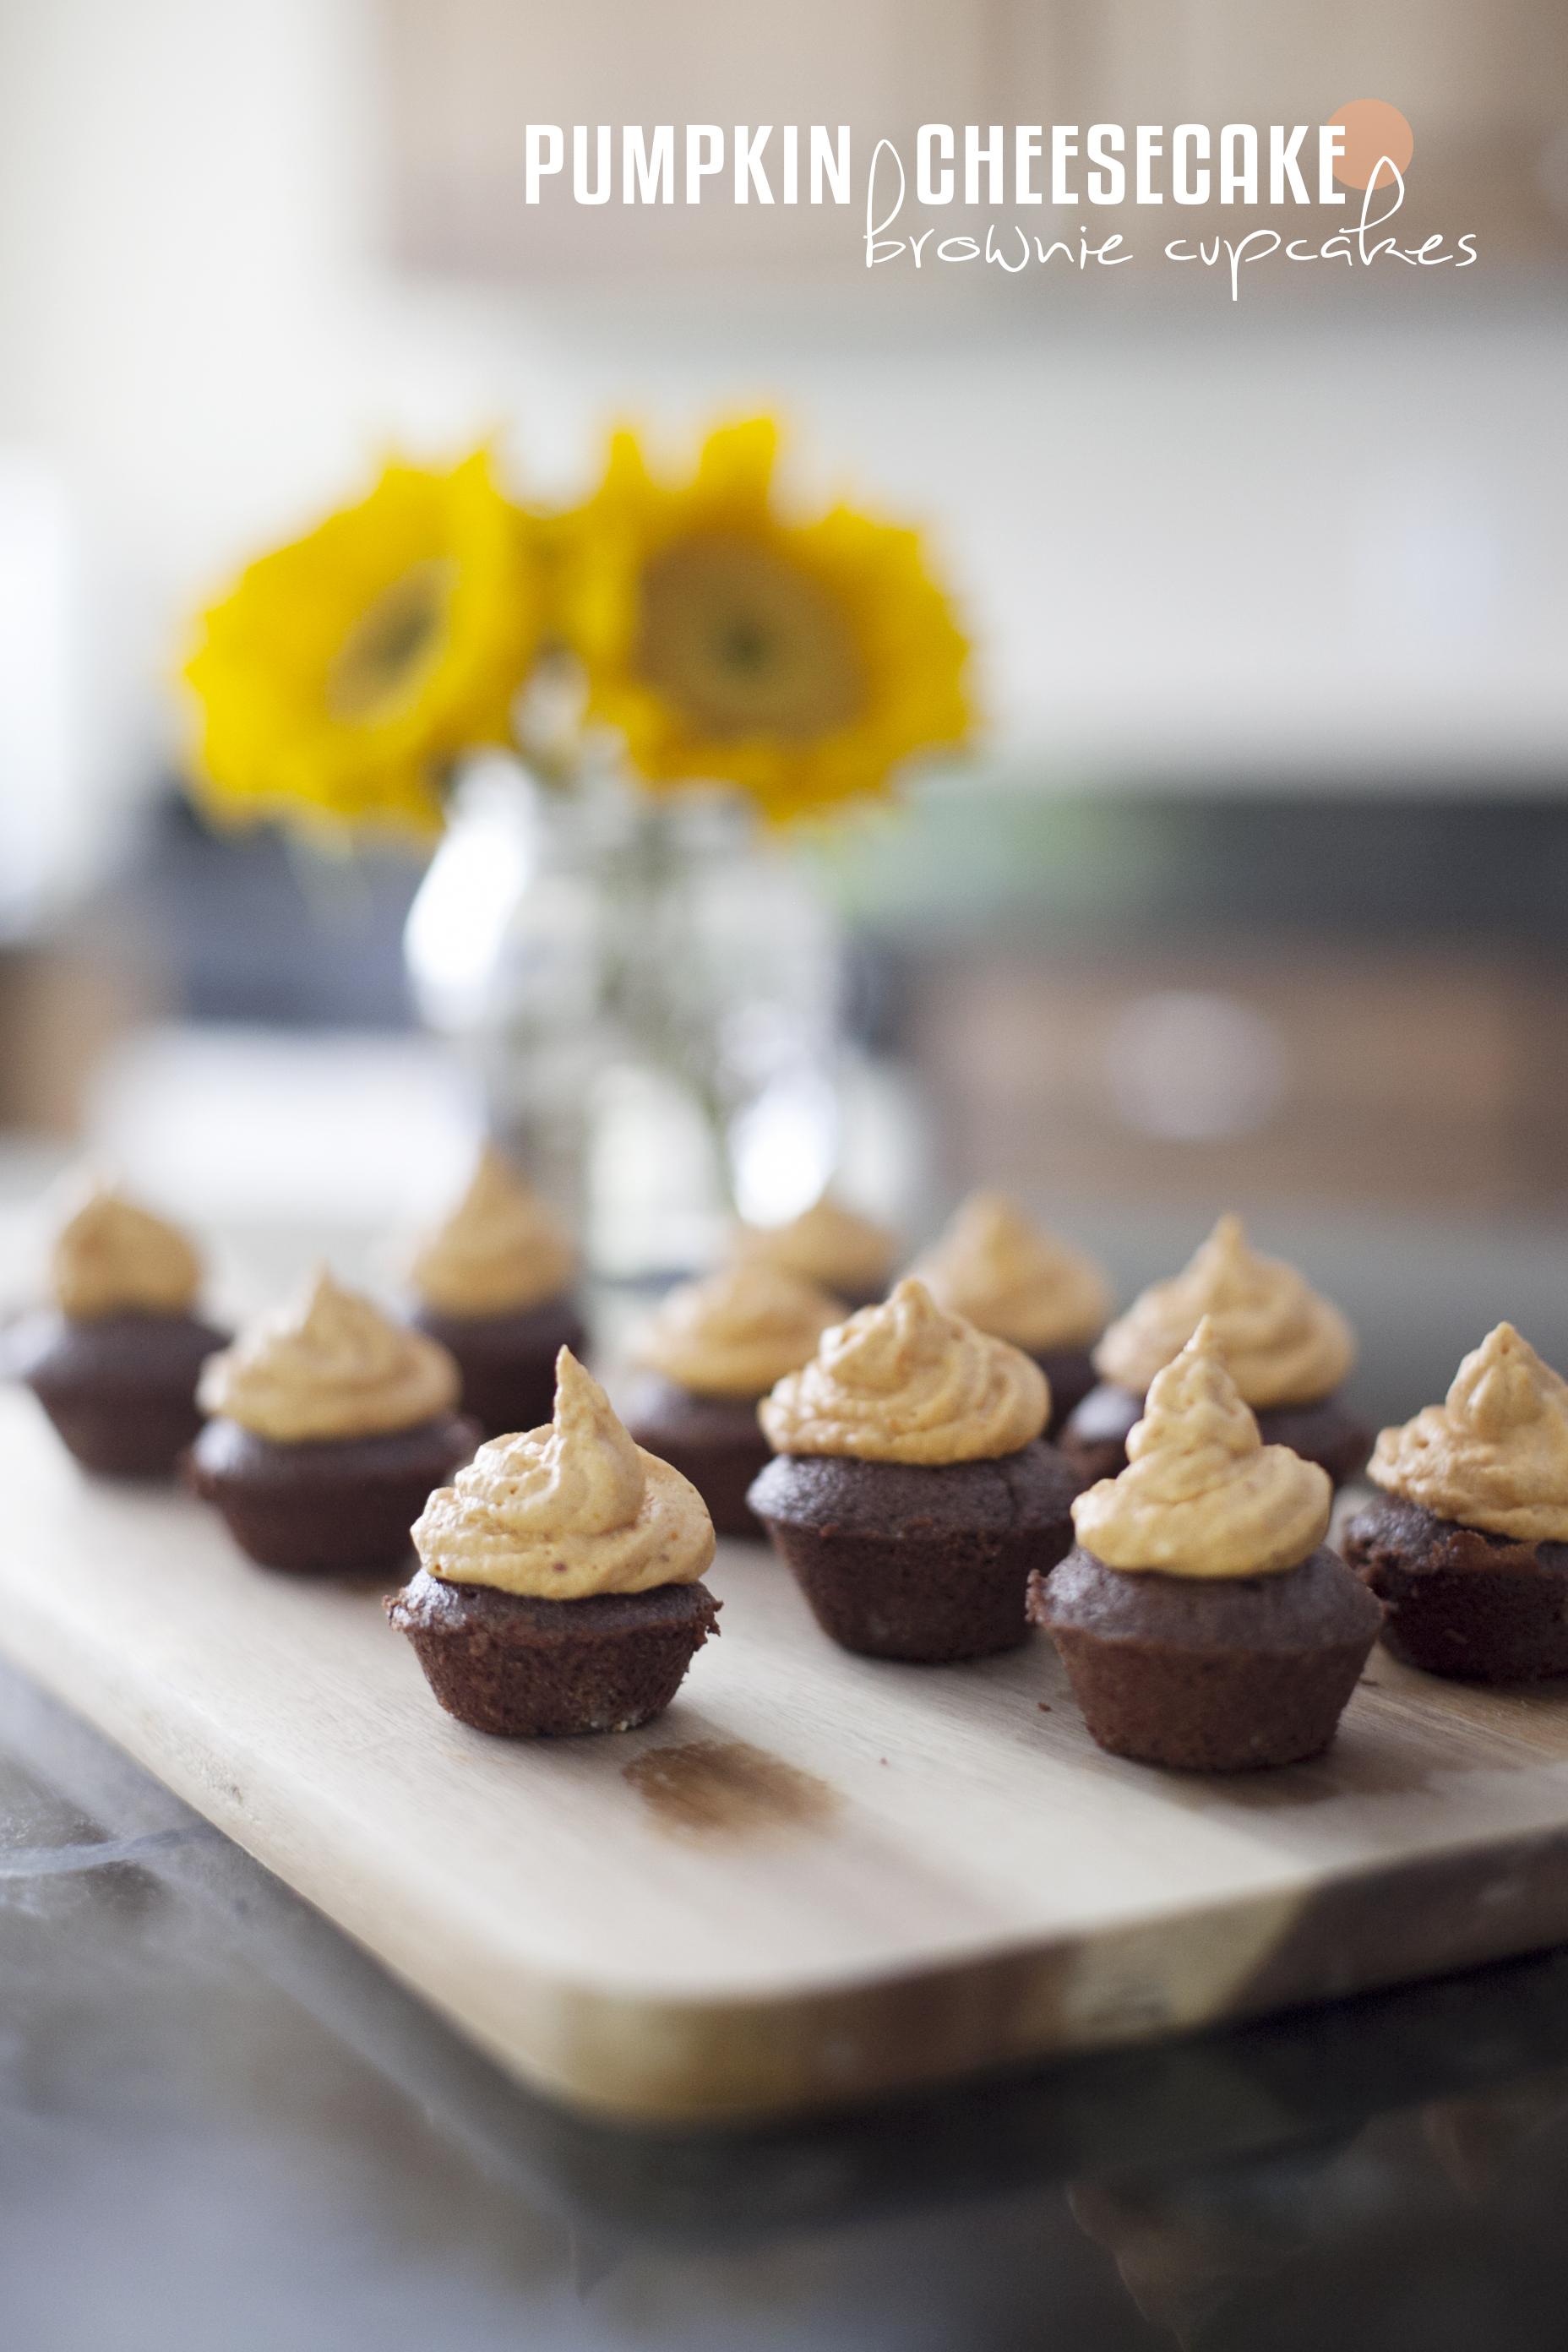 pumpkin cheesecake brownie cupcakes